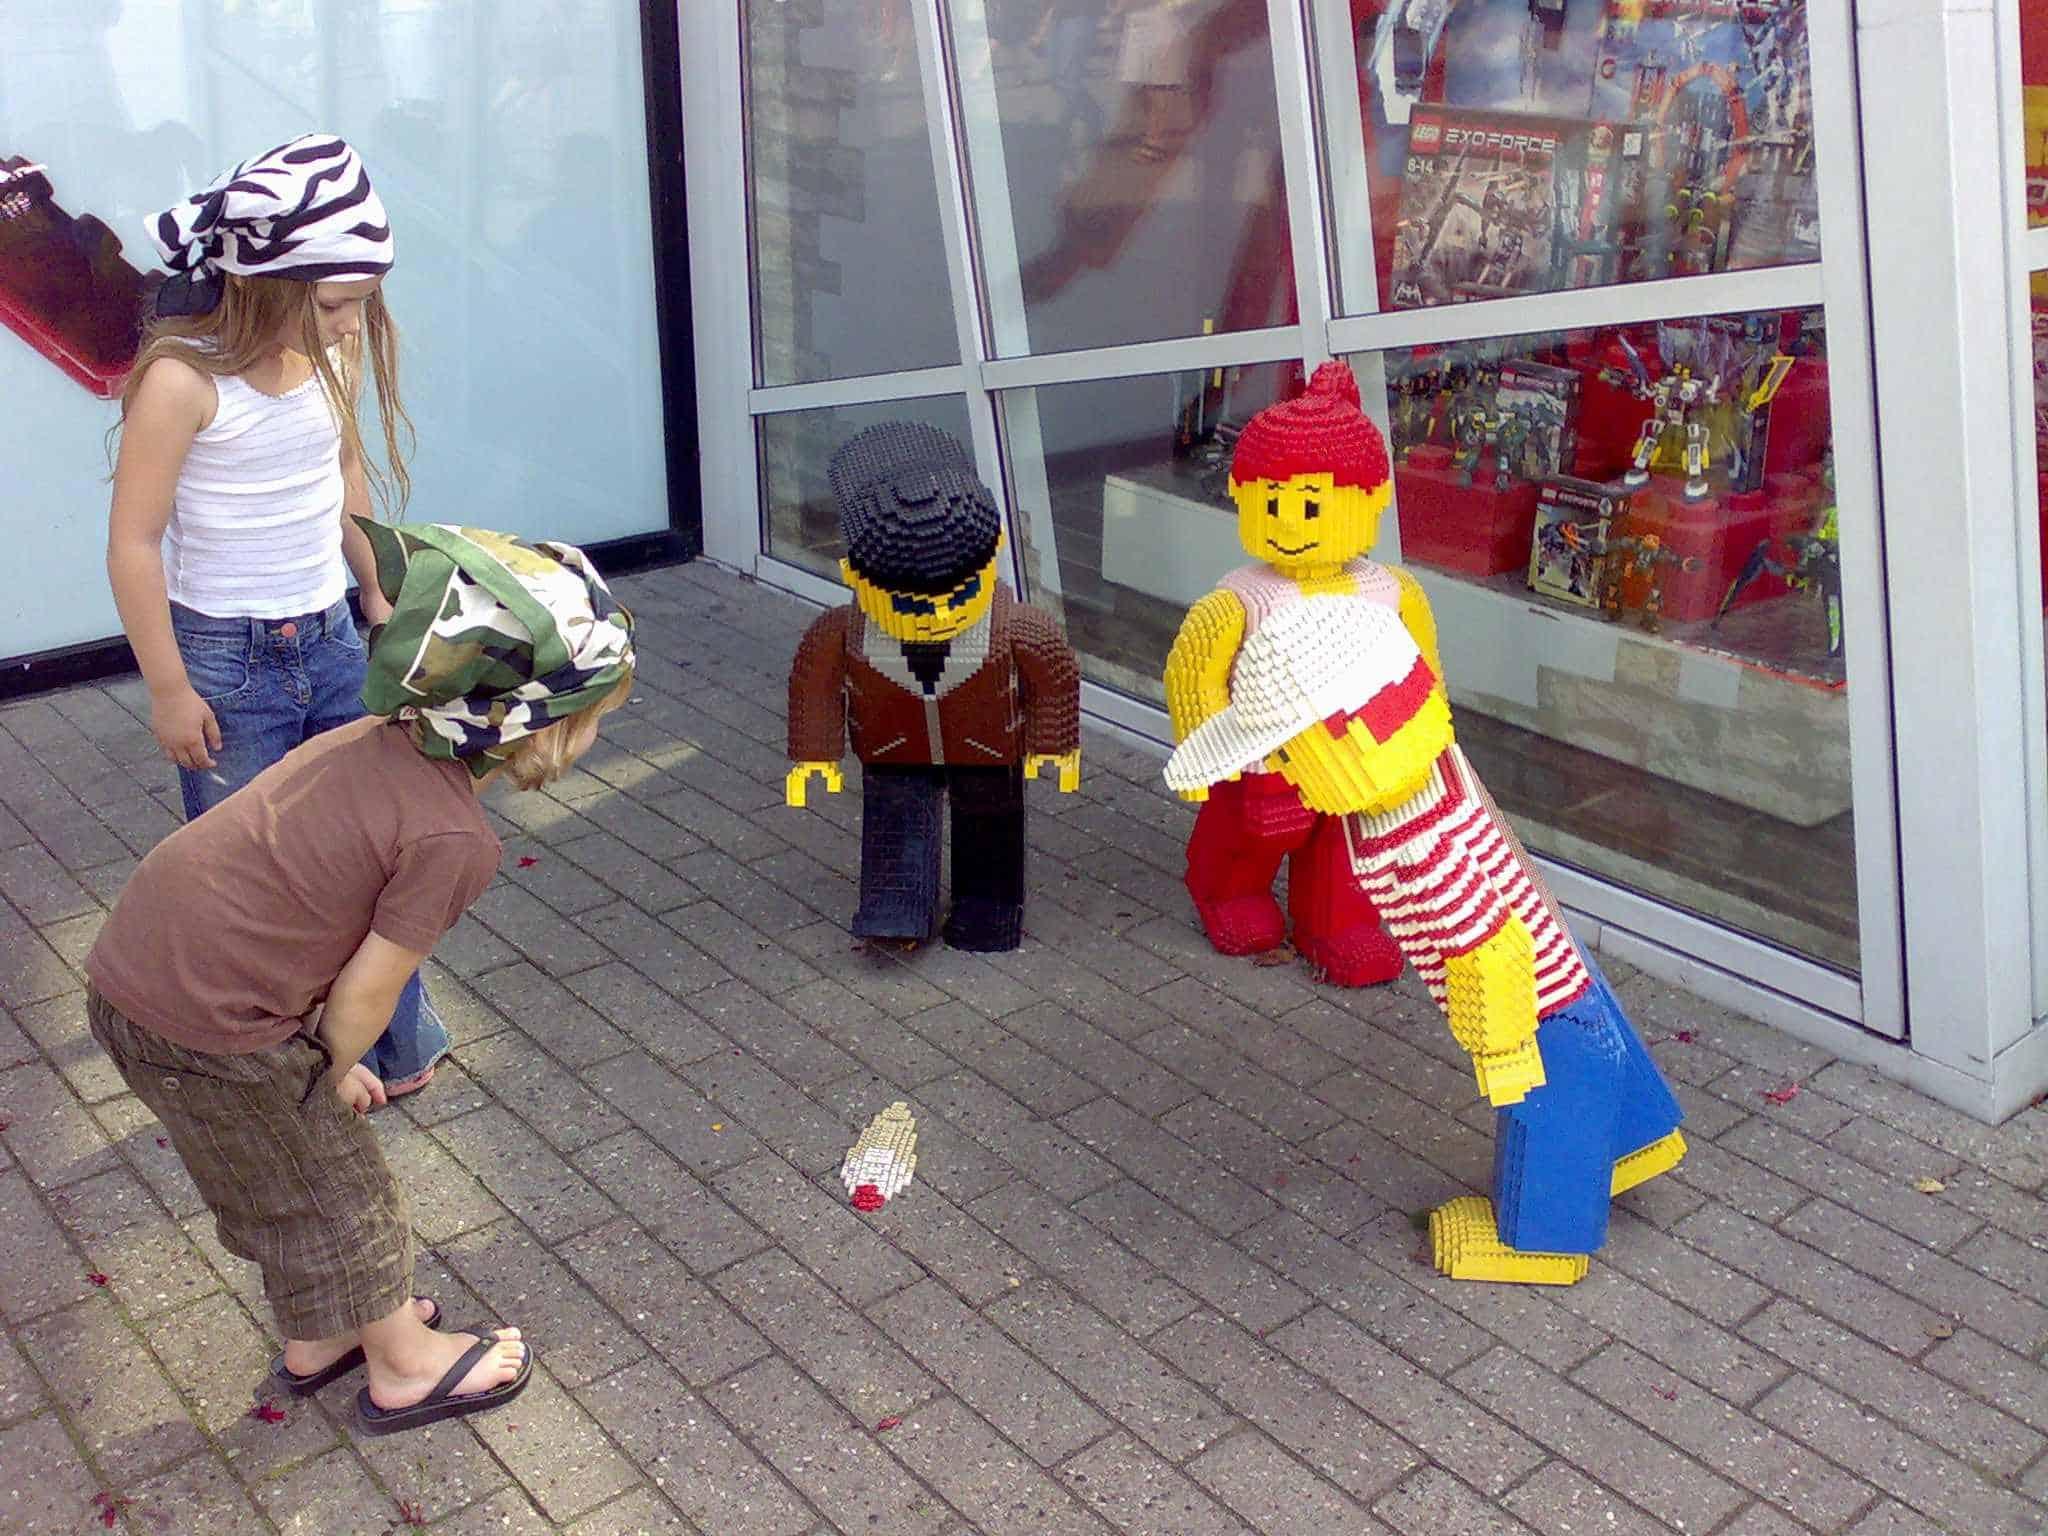 Legoland, Denmark (c) Srsck